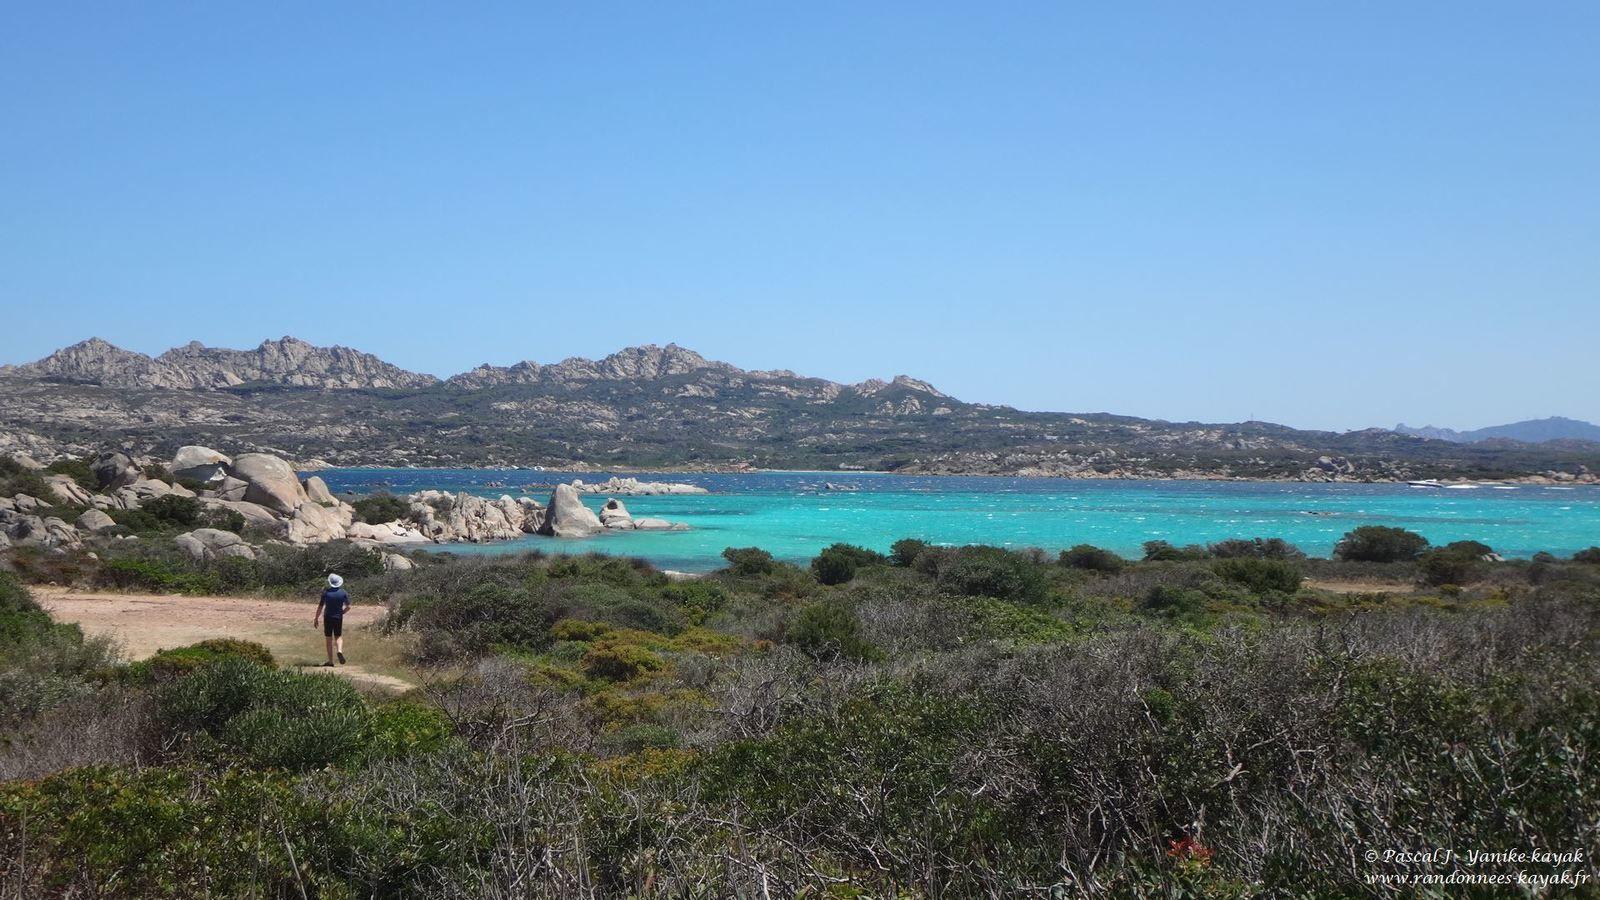 Sardegna 2019, una nuova avventura - Chapitre 15 - Tour de la Maddalena, contrarié par le vent